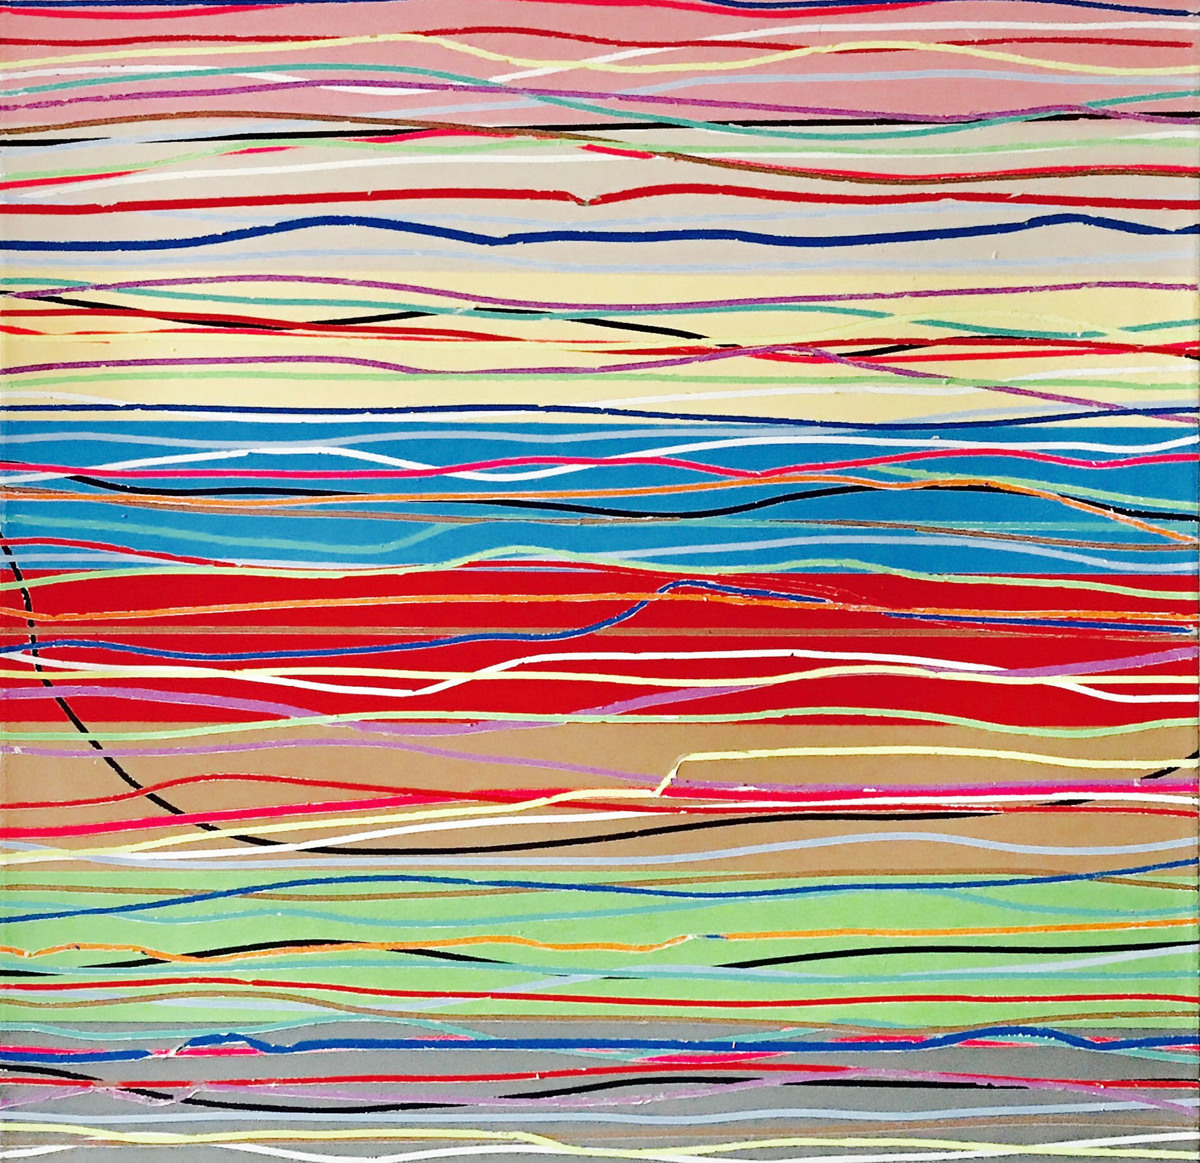 Untitled (Stripes V) (large view)